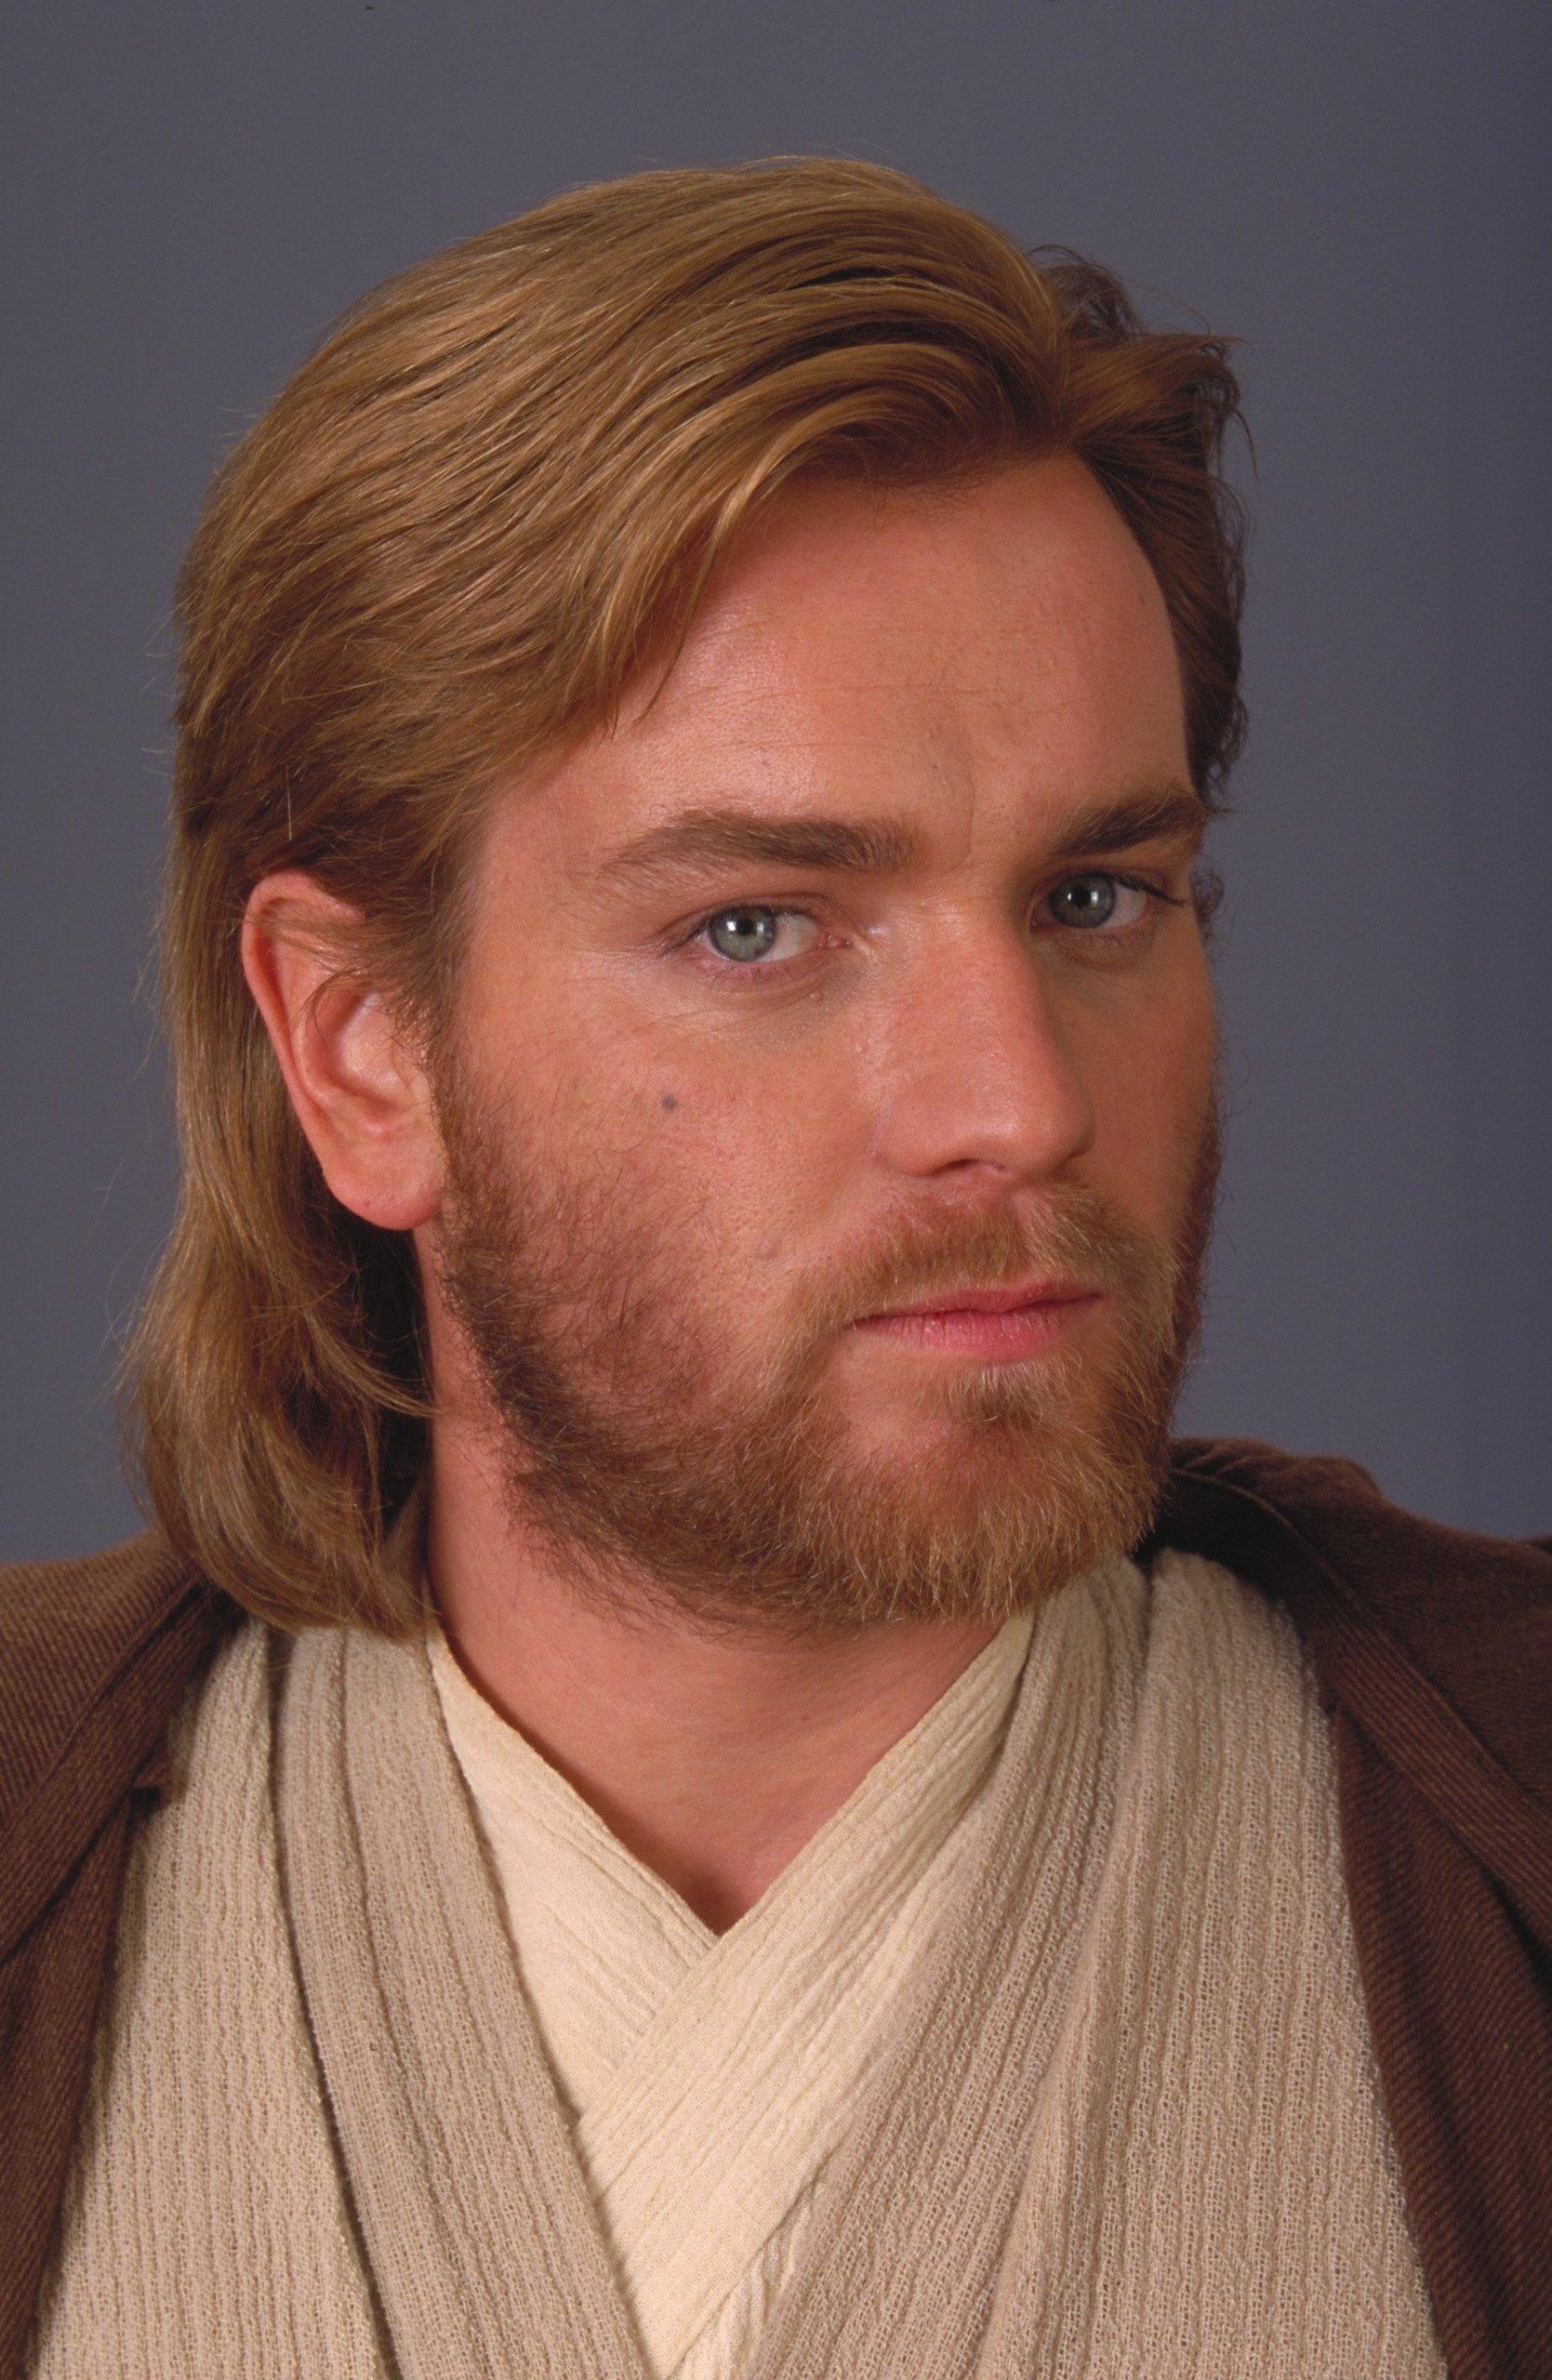 Obi Wan Kenobi  Obi Wan Kenobi Photo (29218268)  Fanpop - Guy Hairstyle